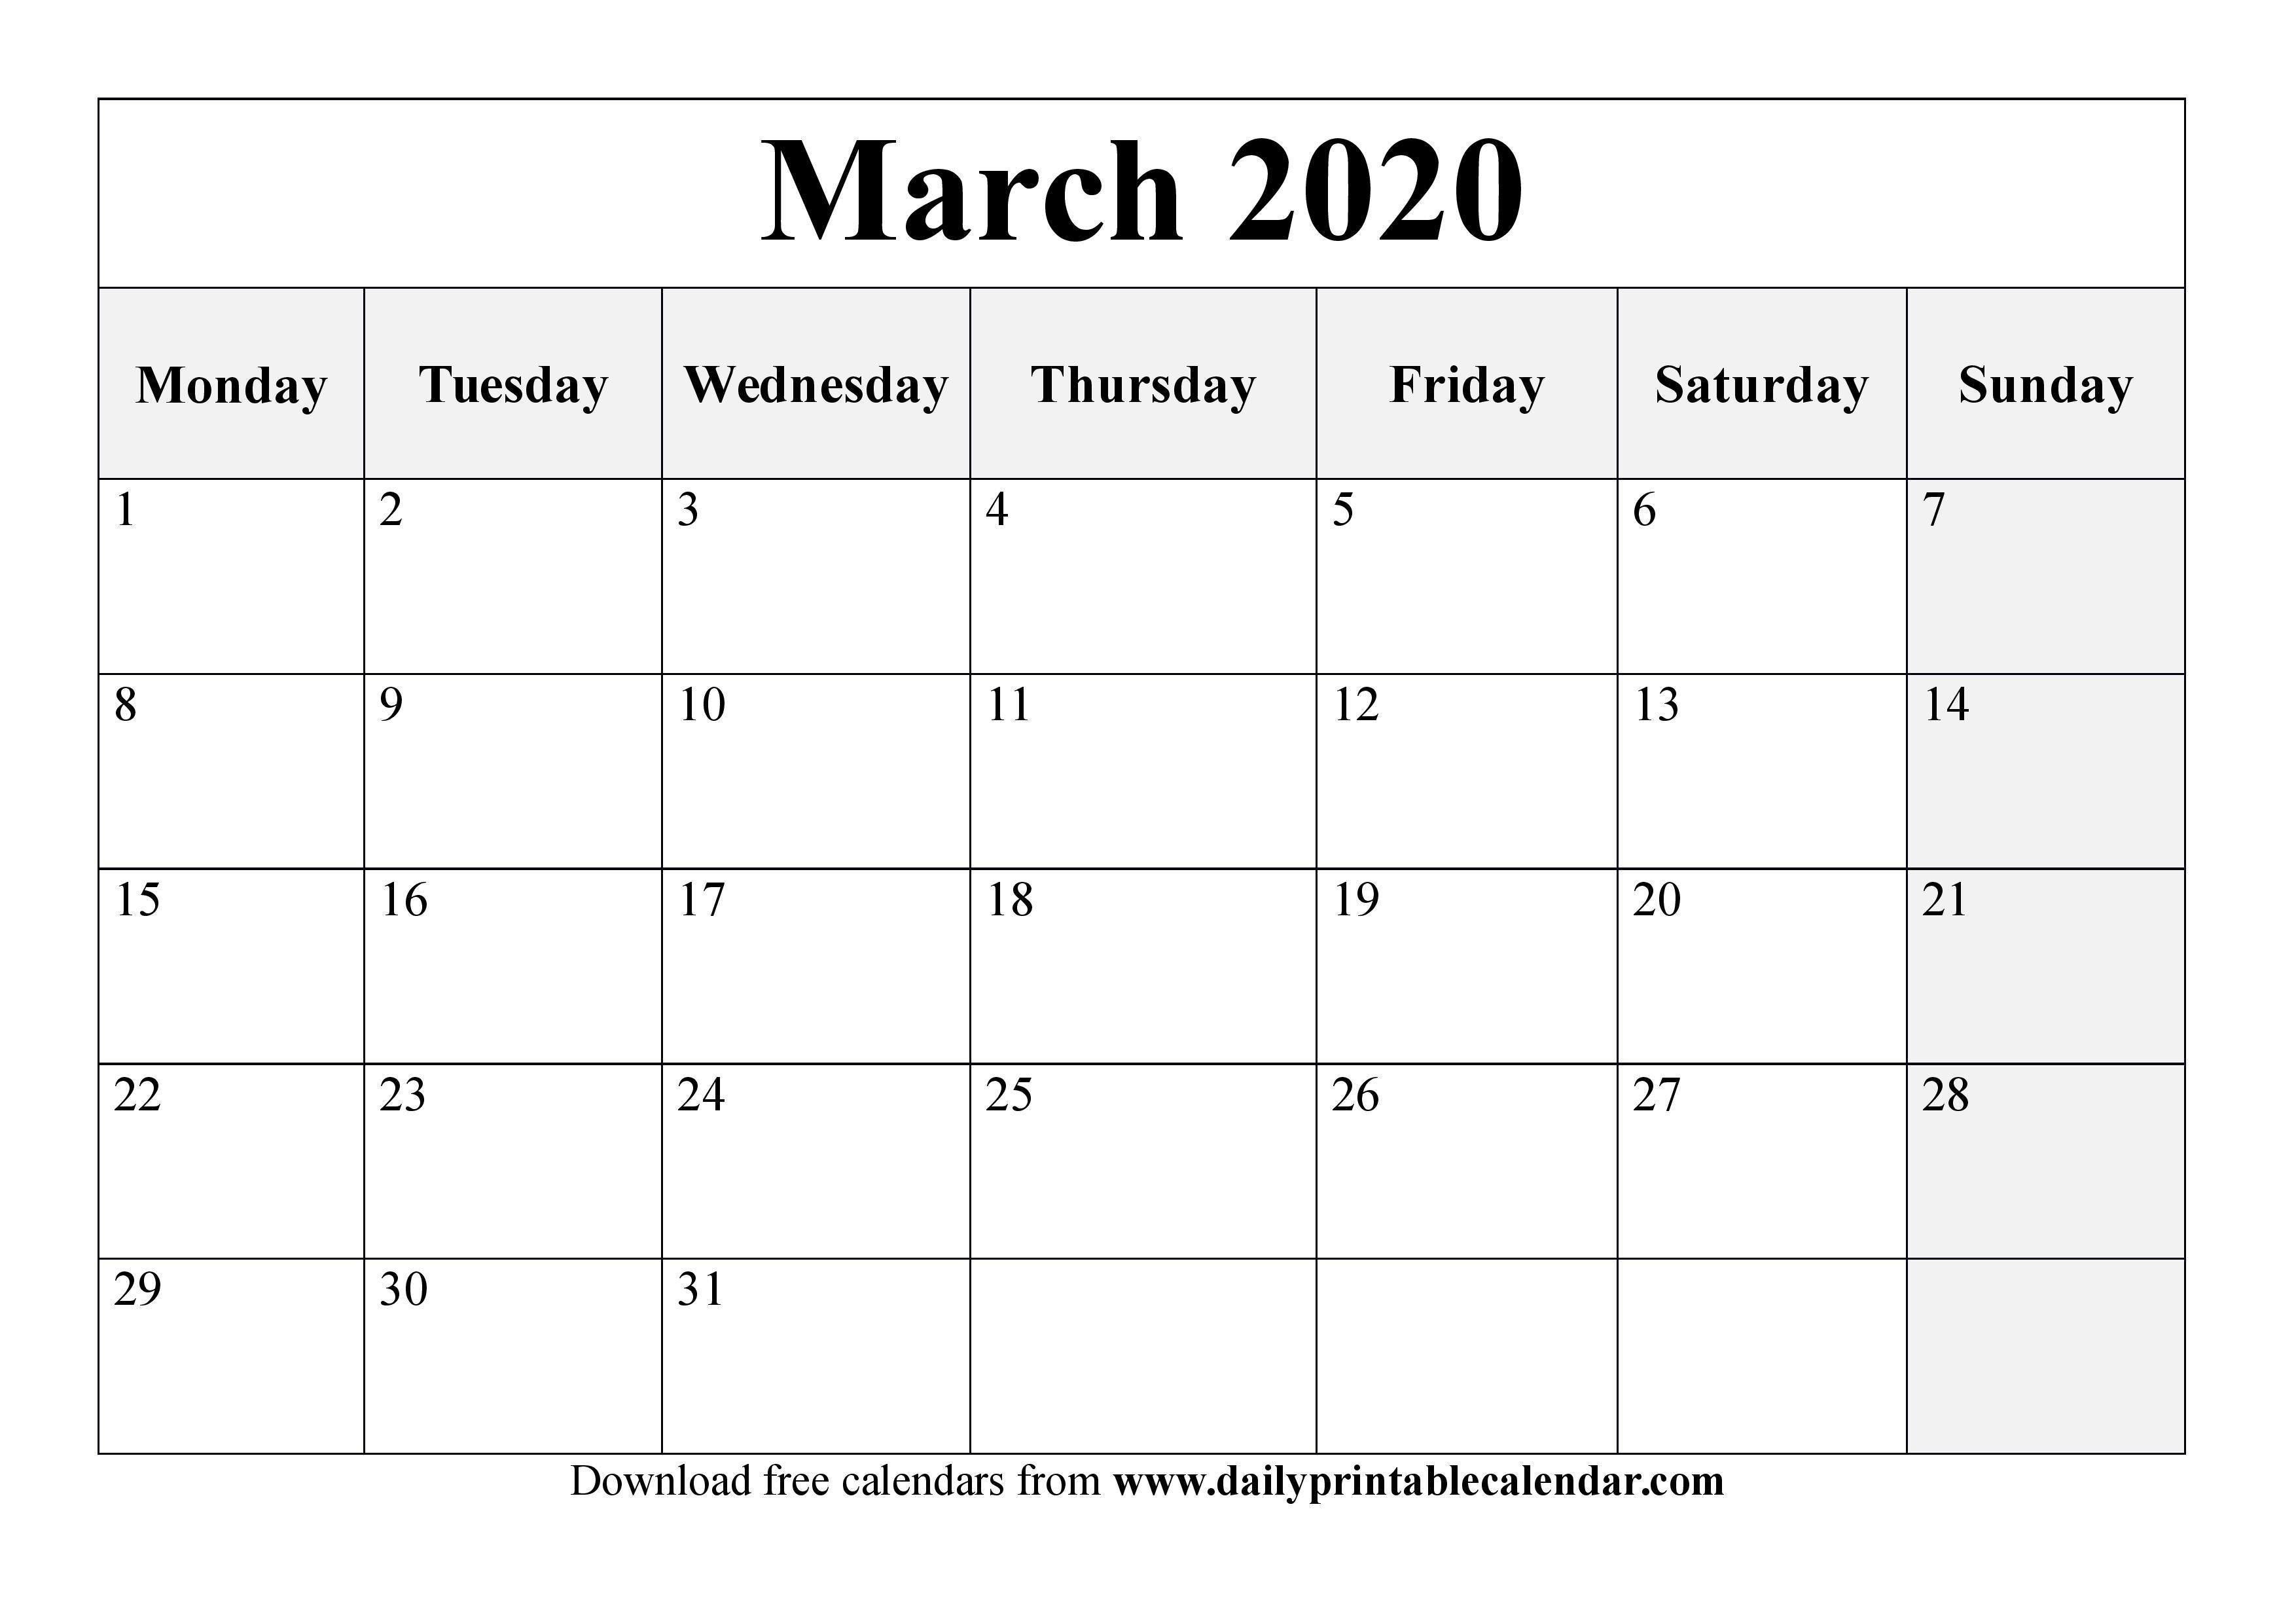 March 2020 Calendar Printable  Blank Templates  2020 Calendar regarding Printable 2020 Calendar Starting Monday